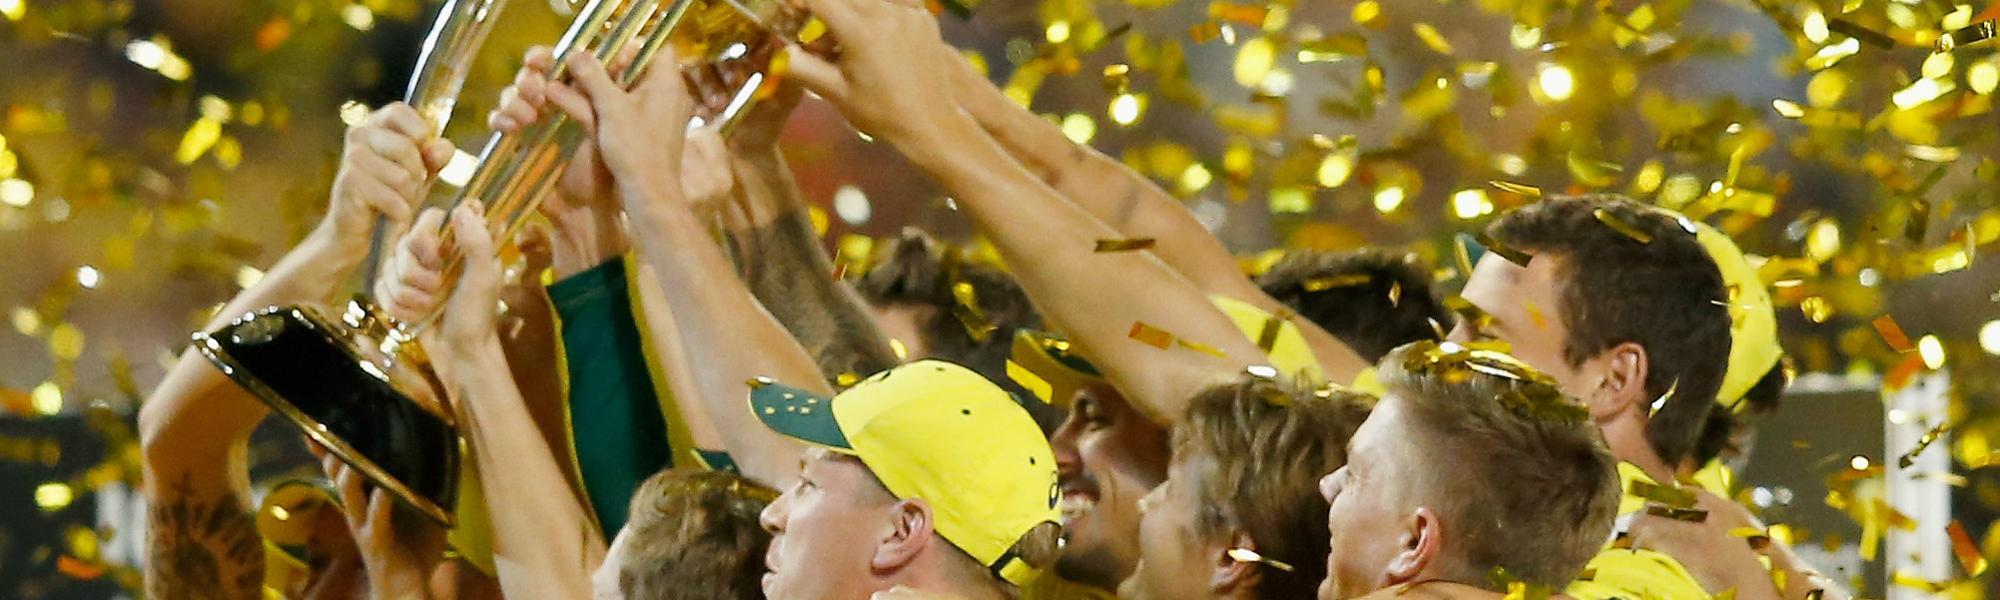 Australia - 2015 World Cup